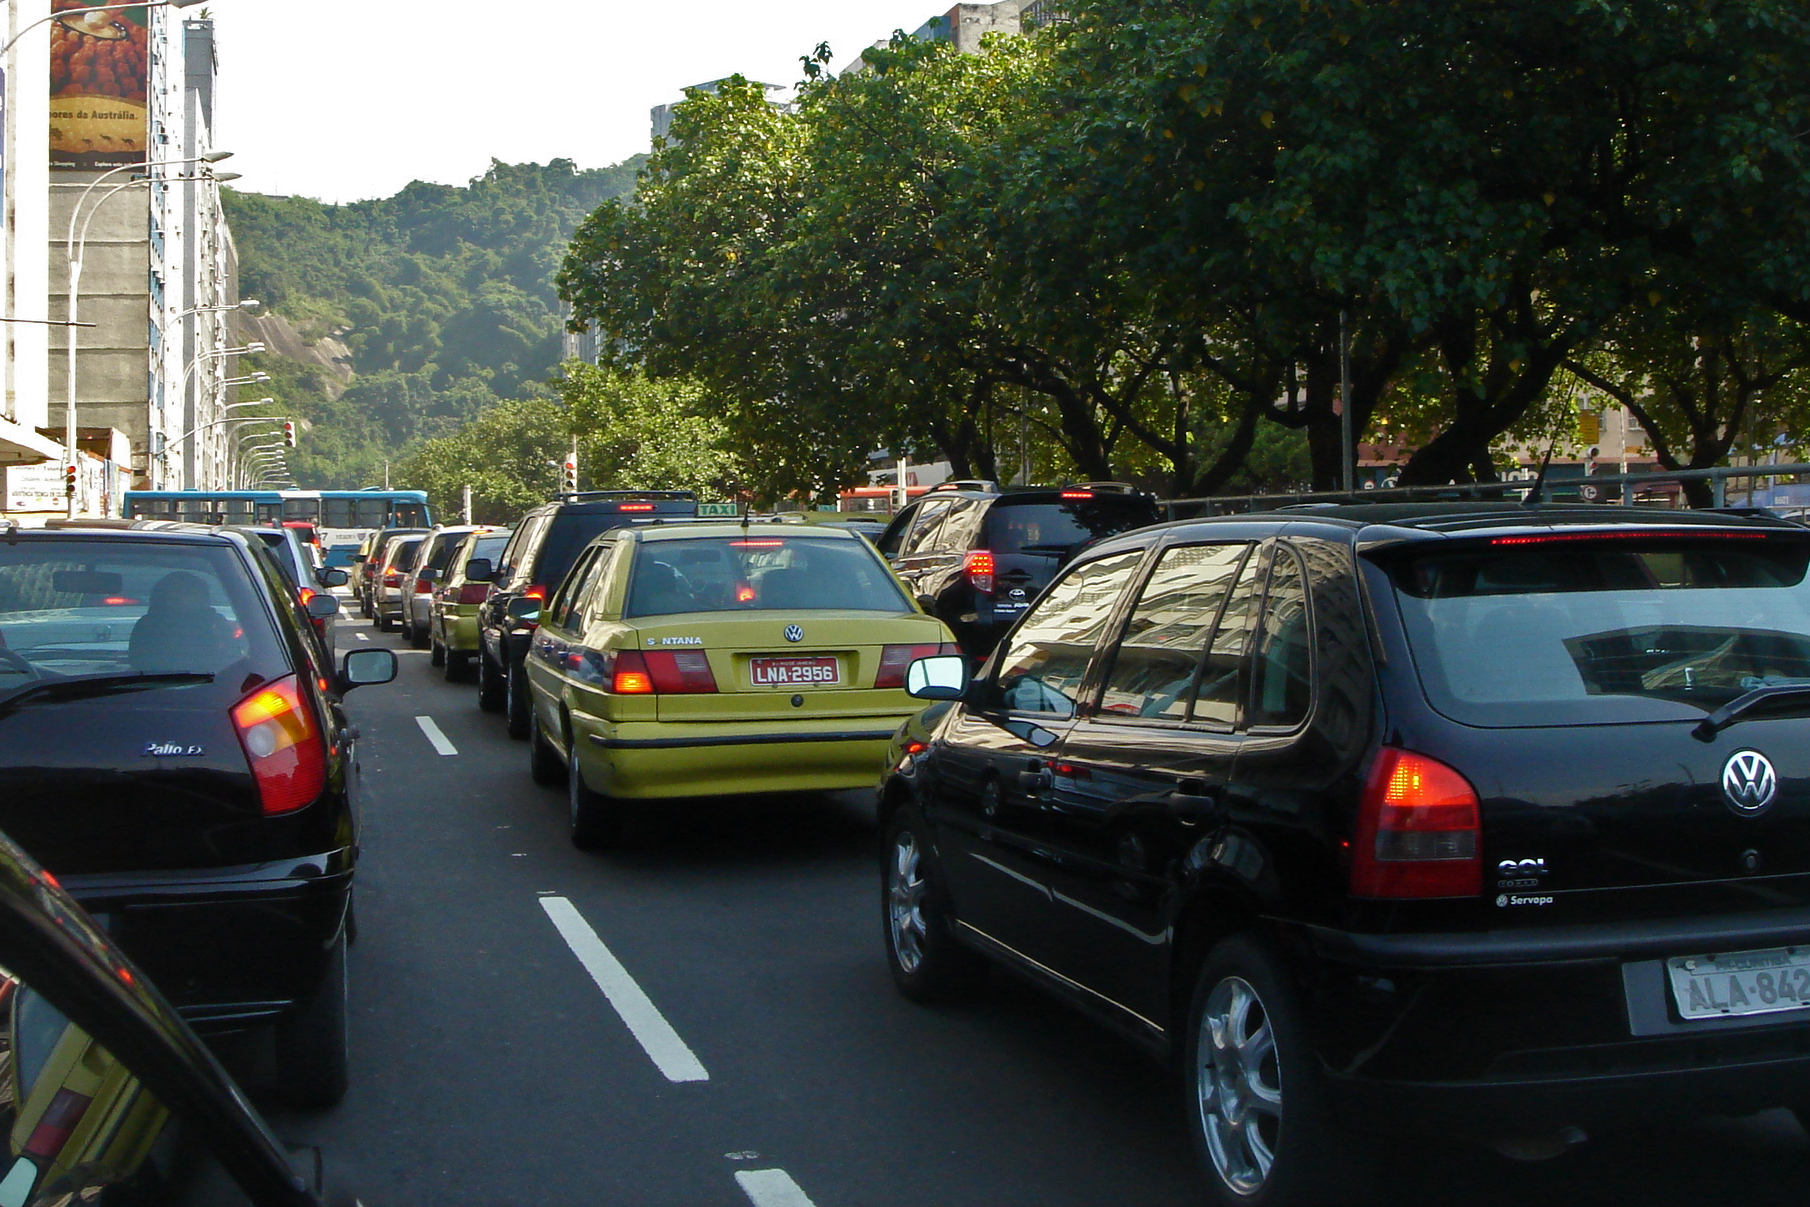 011 Essay Example On Road Accident Wikipedia Traffic Jam Rio De Janeiro 03 2008 28 Imposing Full